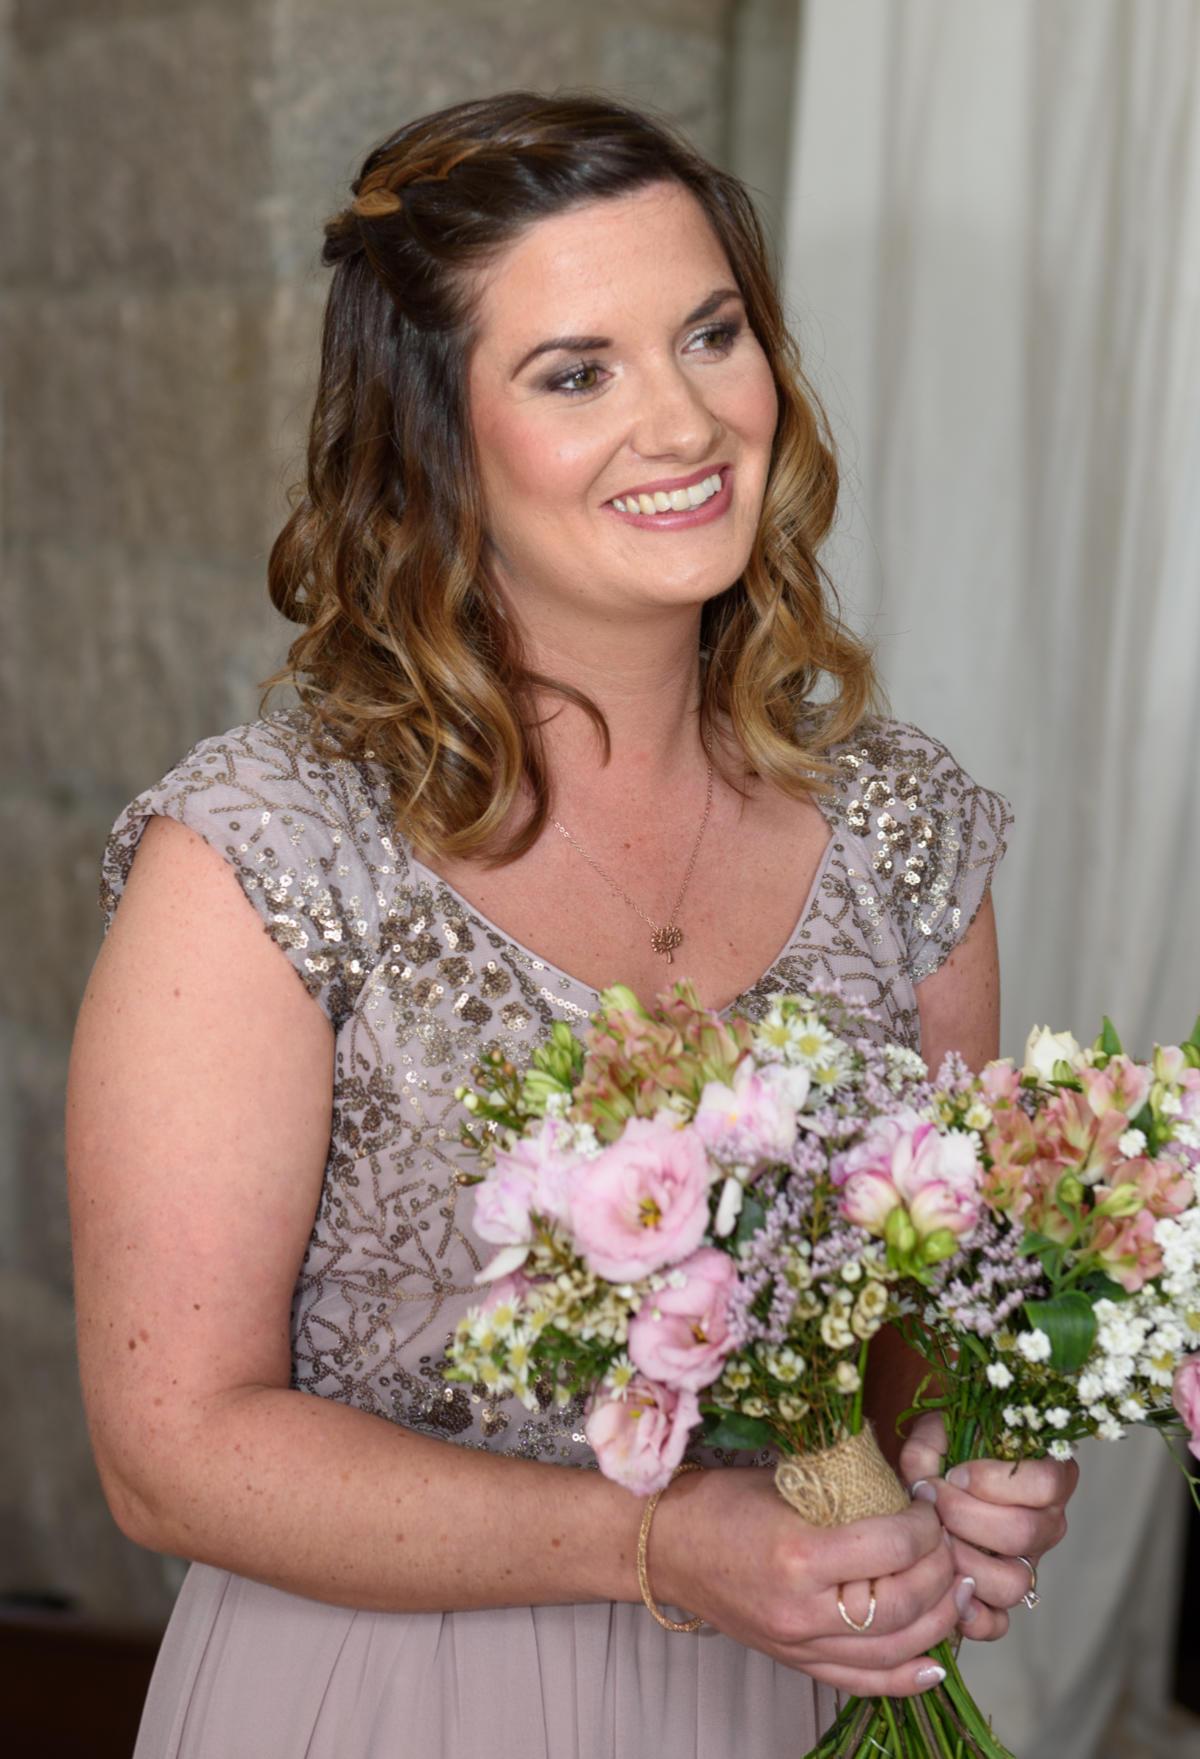 Make up for Wedding Day Image